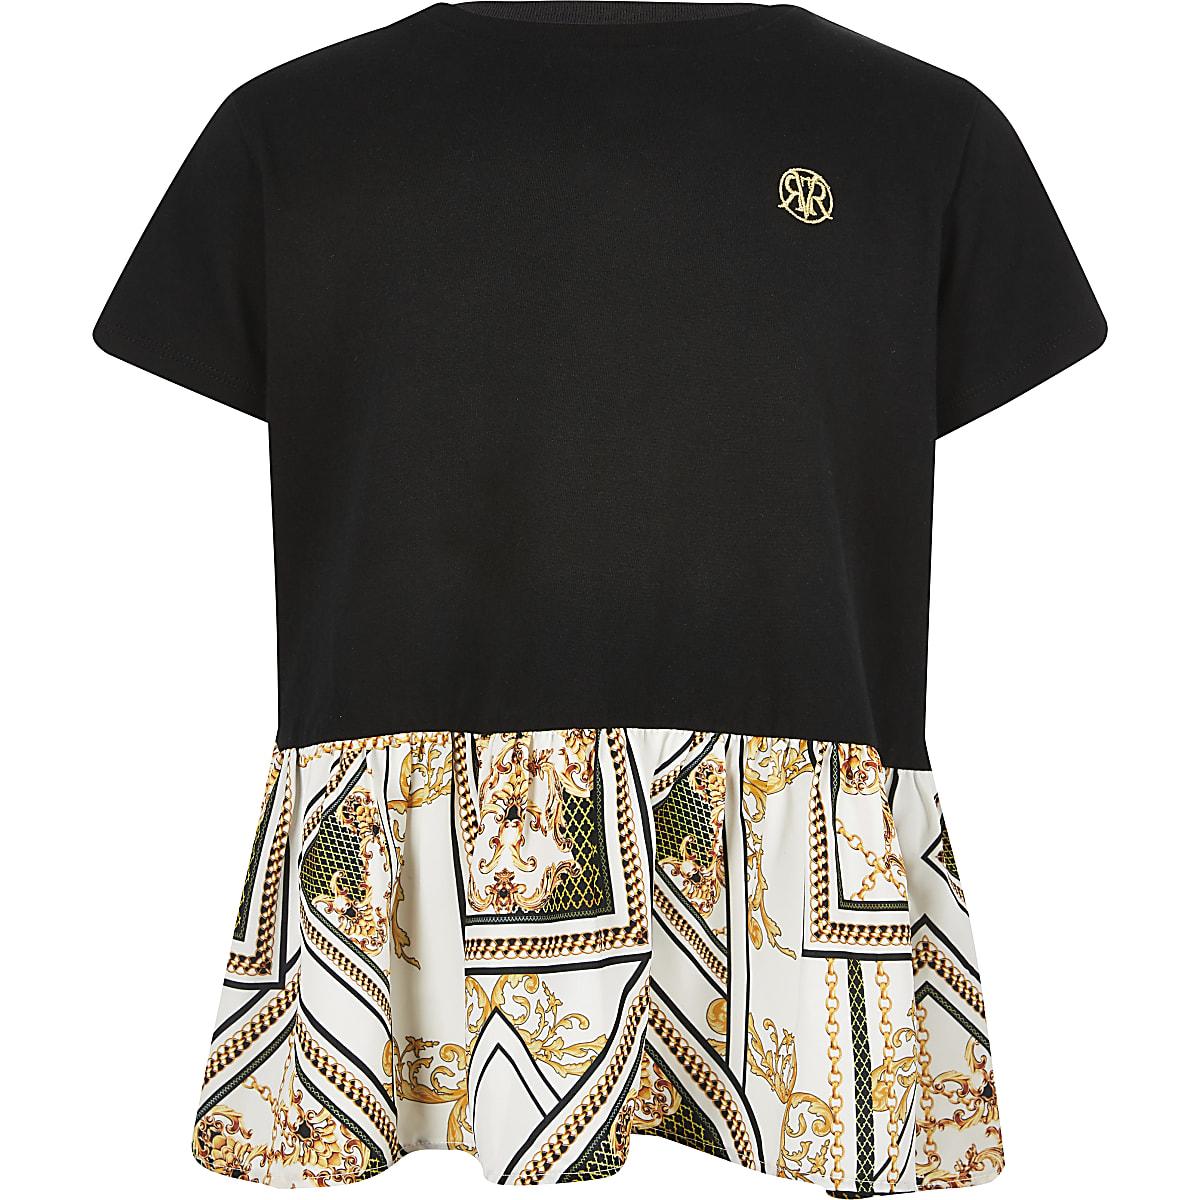 Girls black peplum baroque print t-shirt